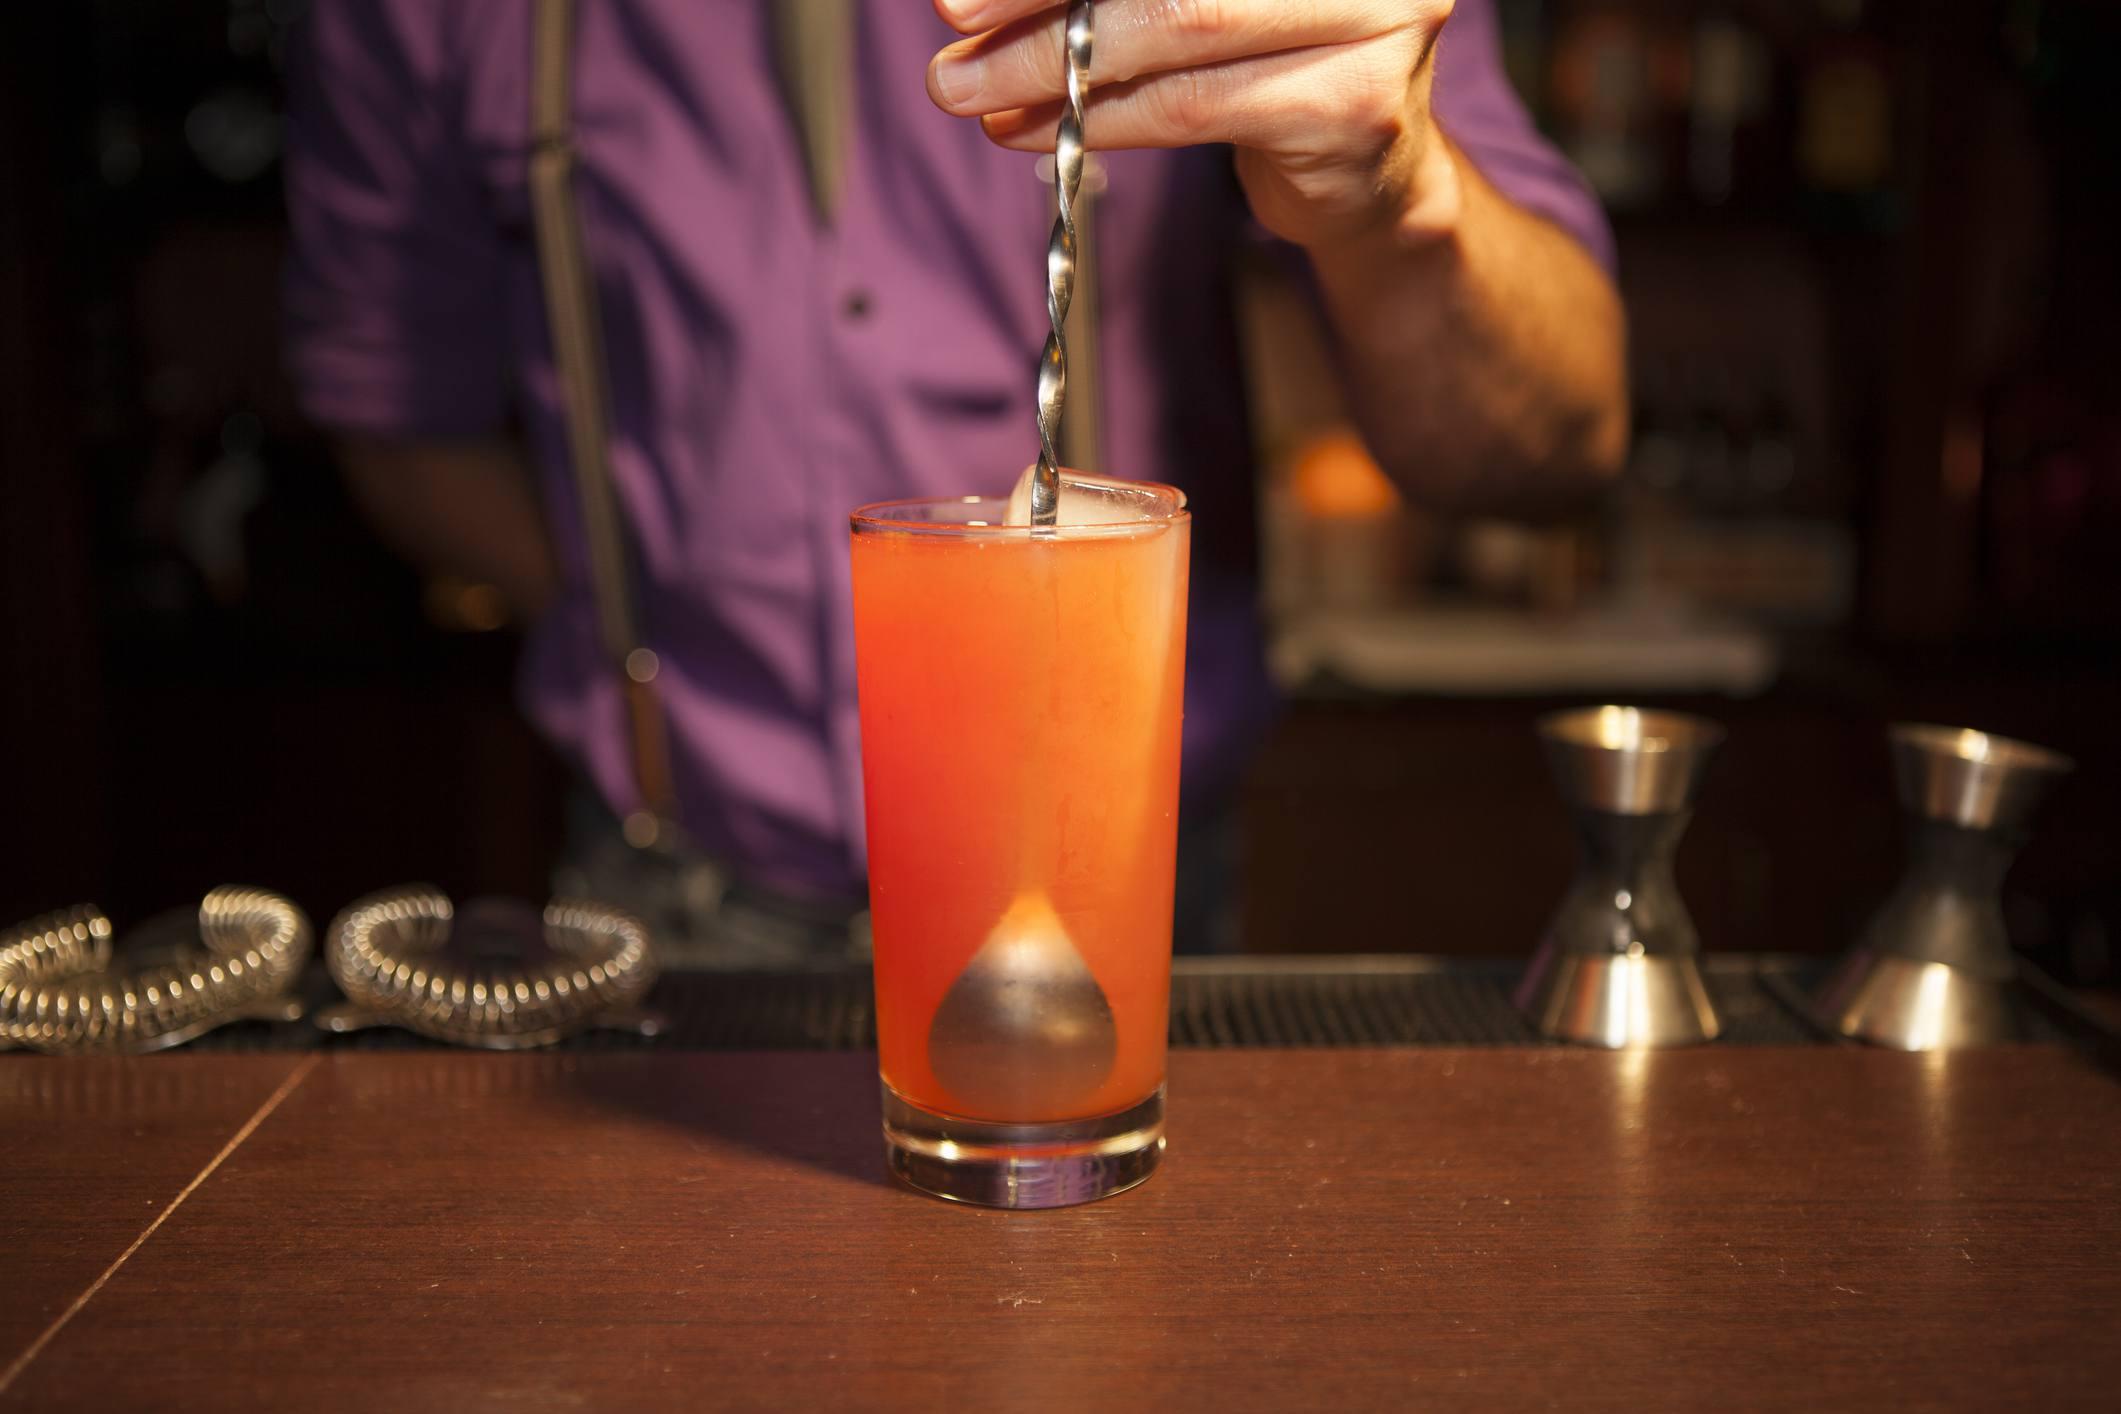 Cocktail on Bar with Stirrer